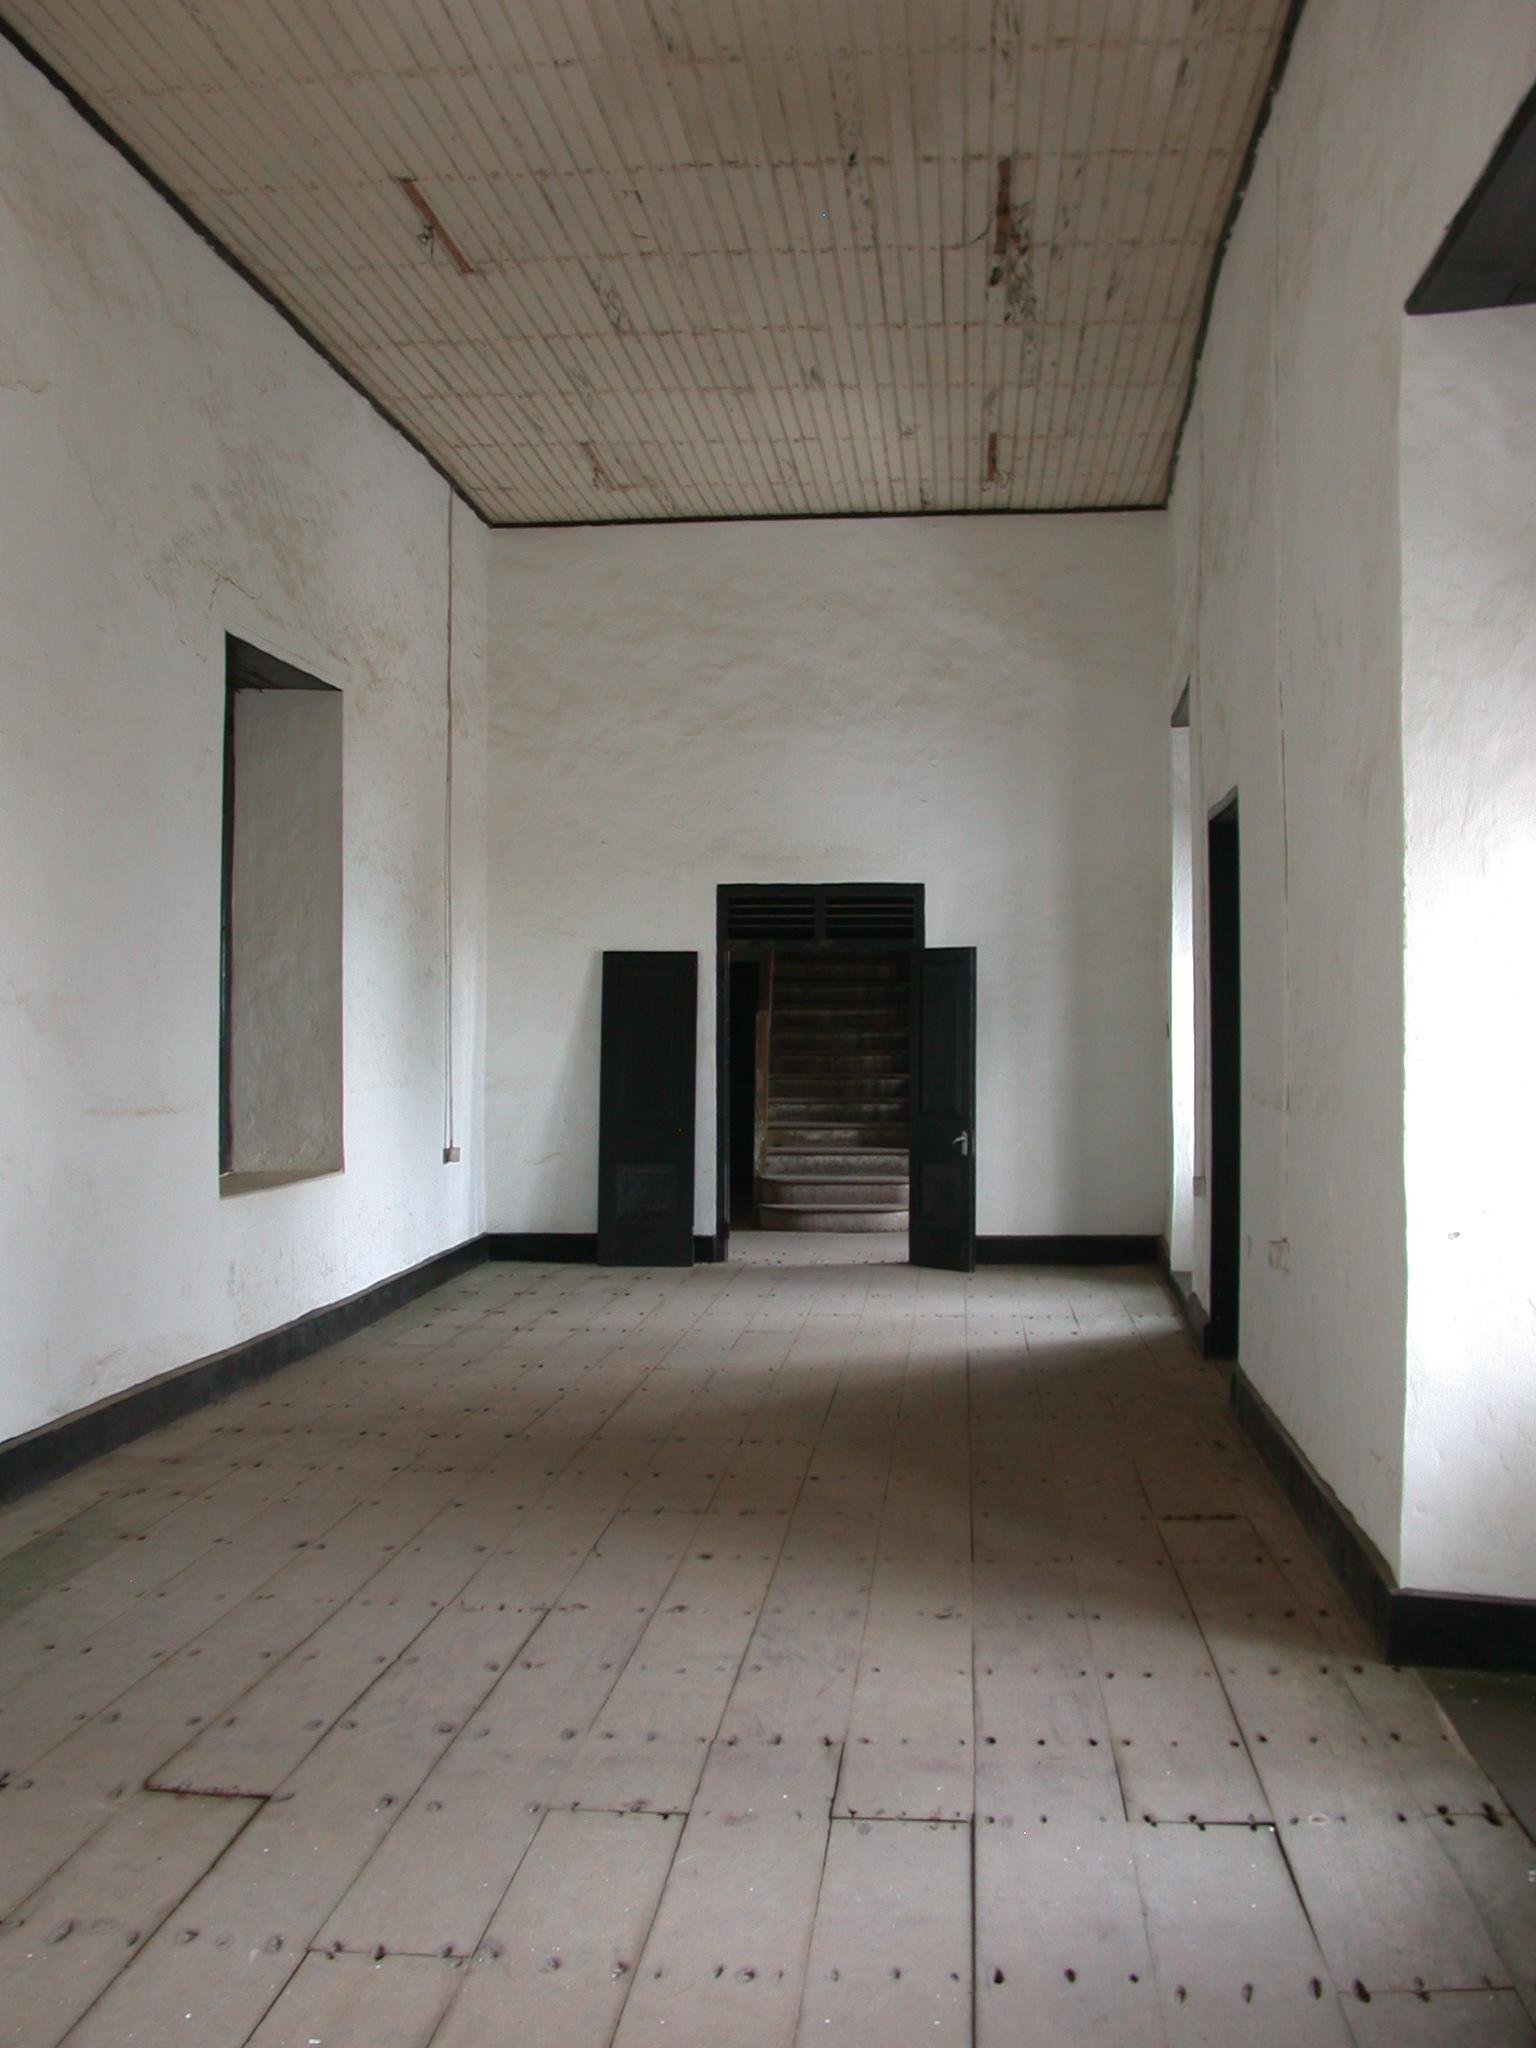 Interior Upper Level Corridor, Elmina Slave Fort, Elmina, Ghana